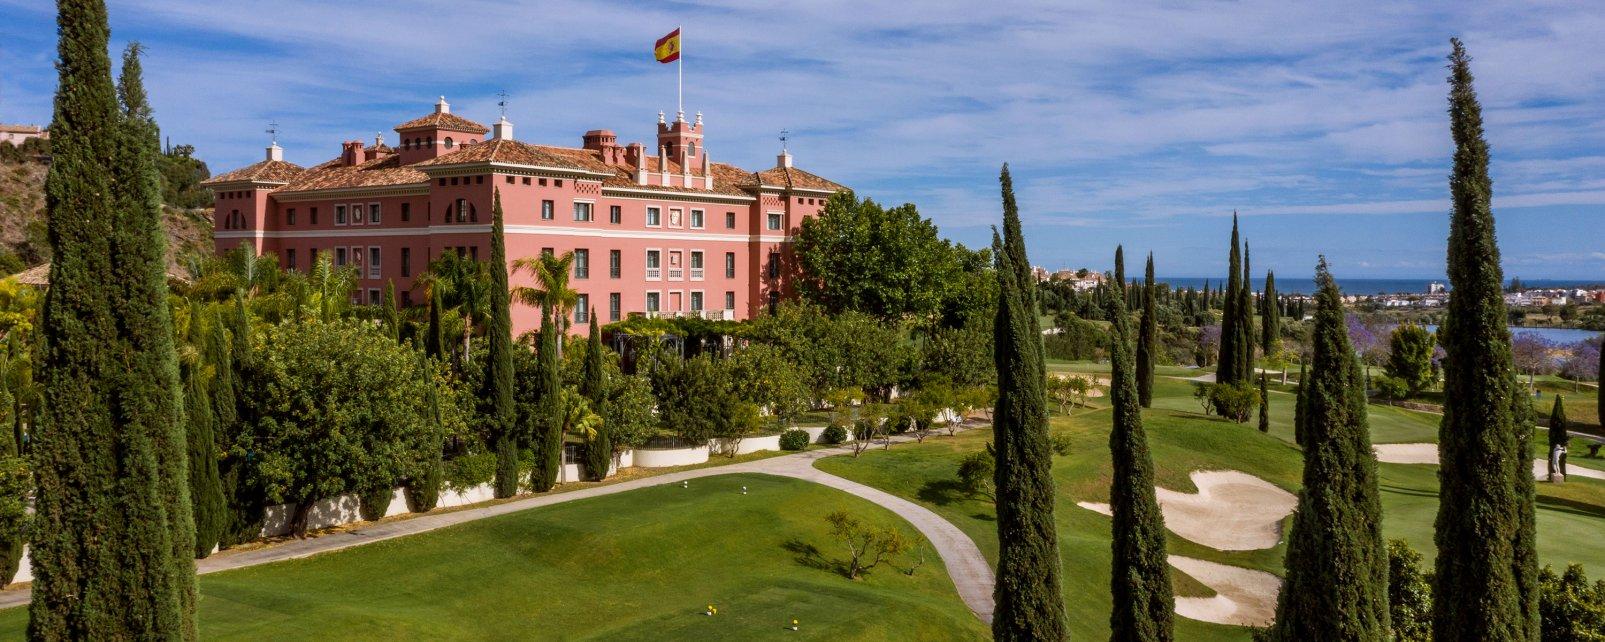 Hôtel Villa Padierna